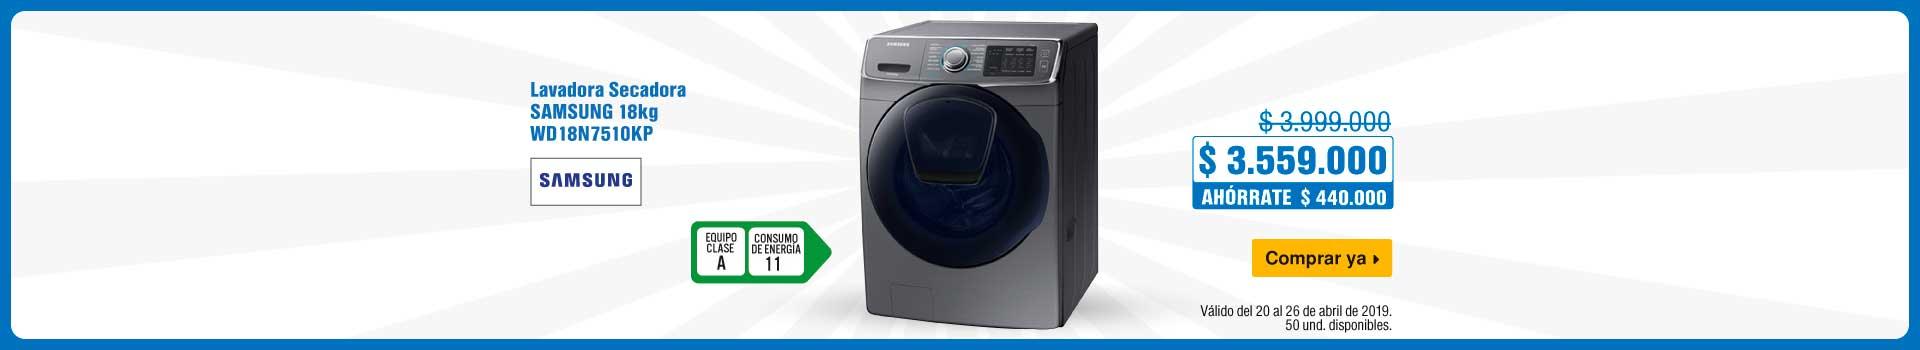 AK-KT-mayores-3-ELECT-BCAT-lavadoras-samsung-200419